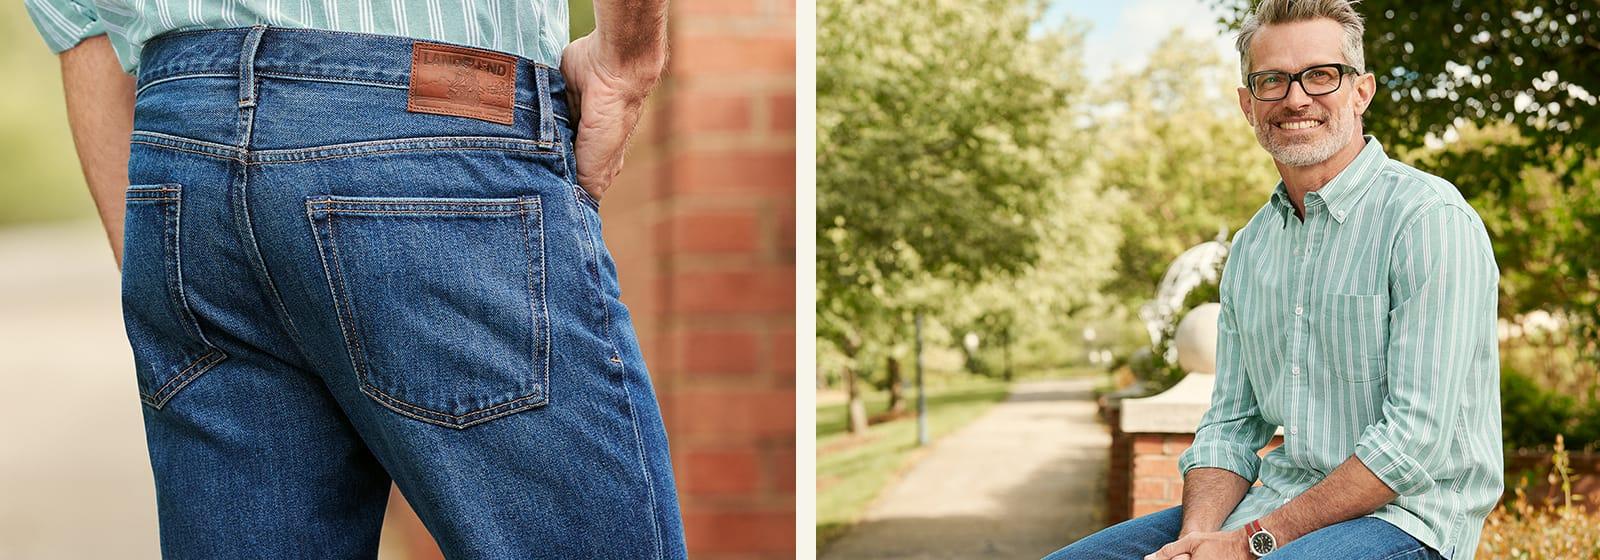 Minimalist Man: 5 Essentials for Your Basic Wardrobe | Lands' End